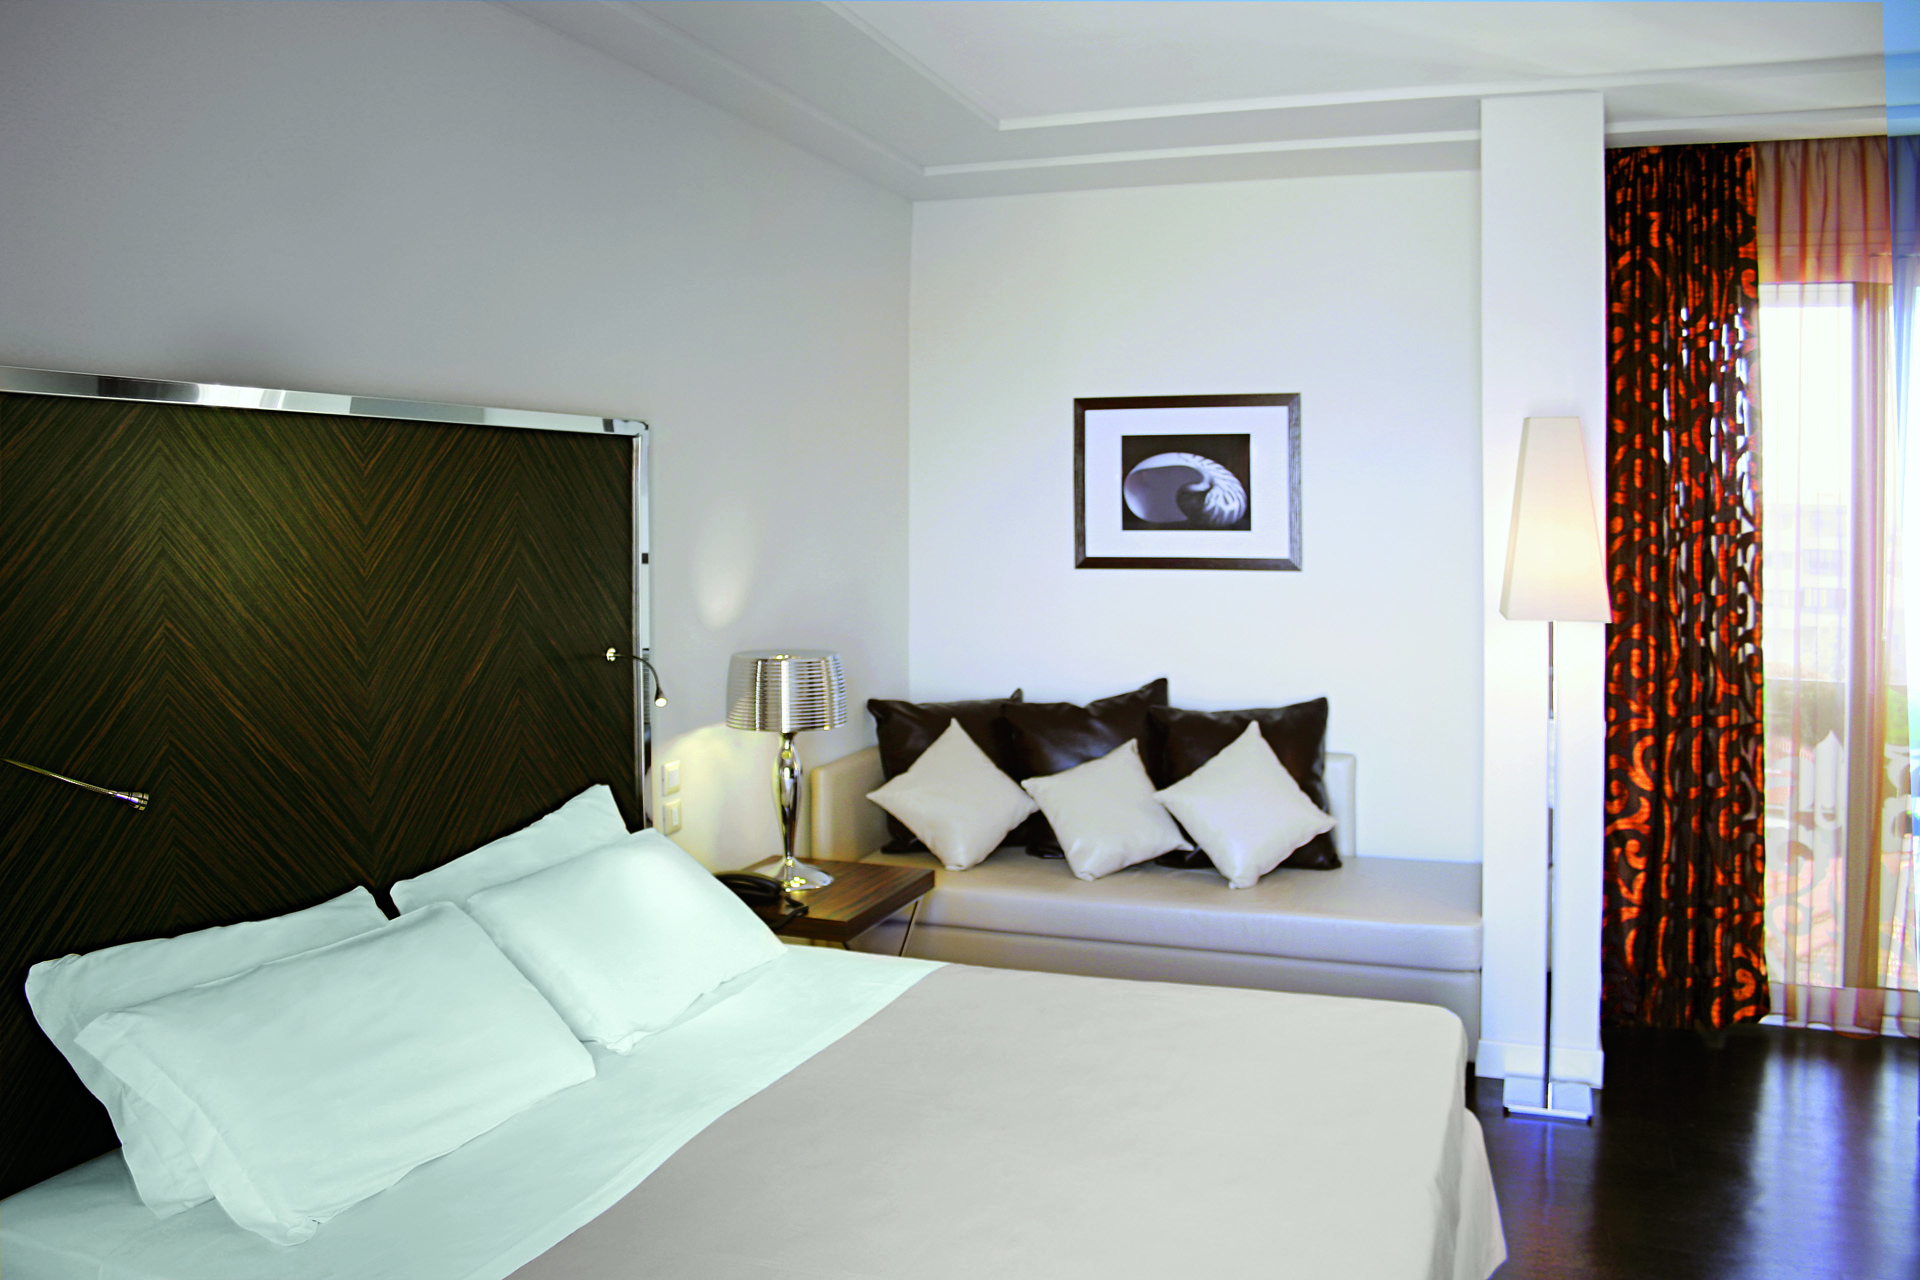 Hotel Byron Rimini | Studio Materia 04